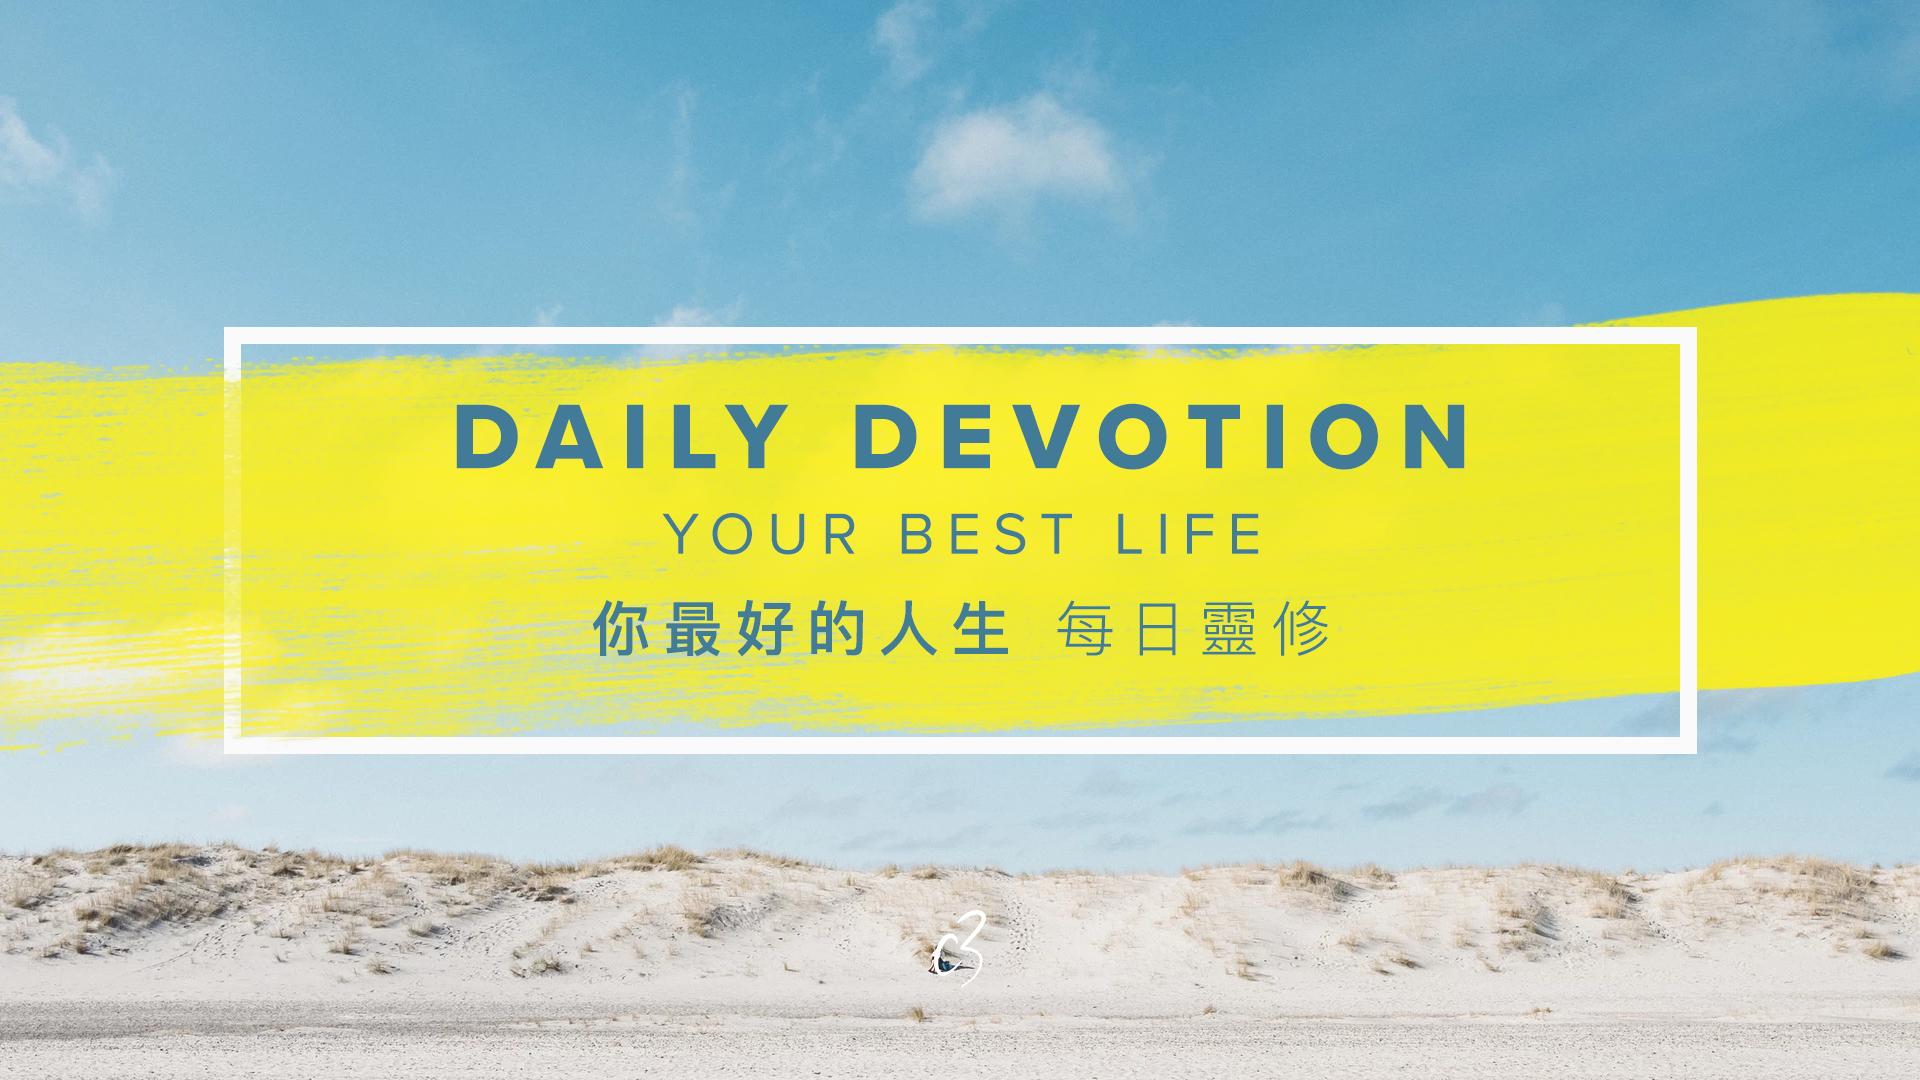 THE POWER GOD PROMISES - C3 Church Hong Kong